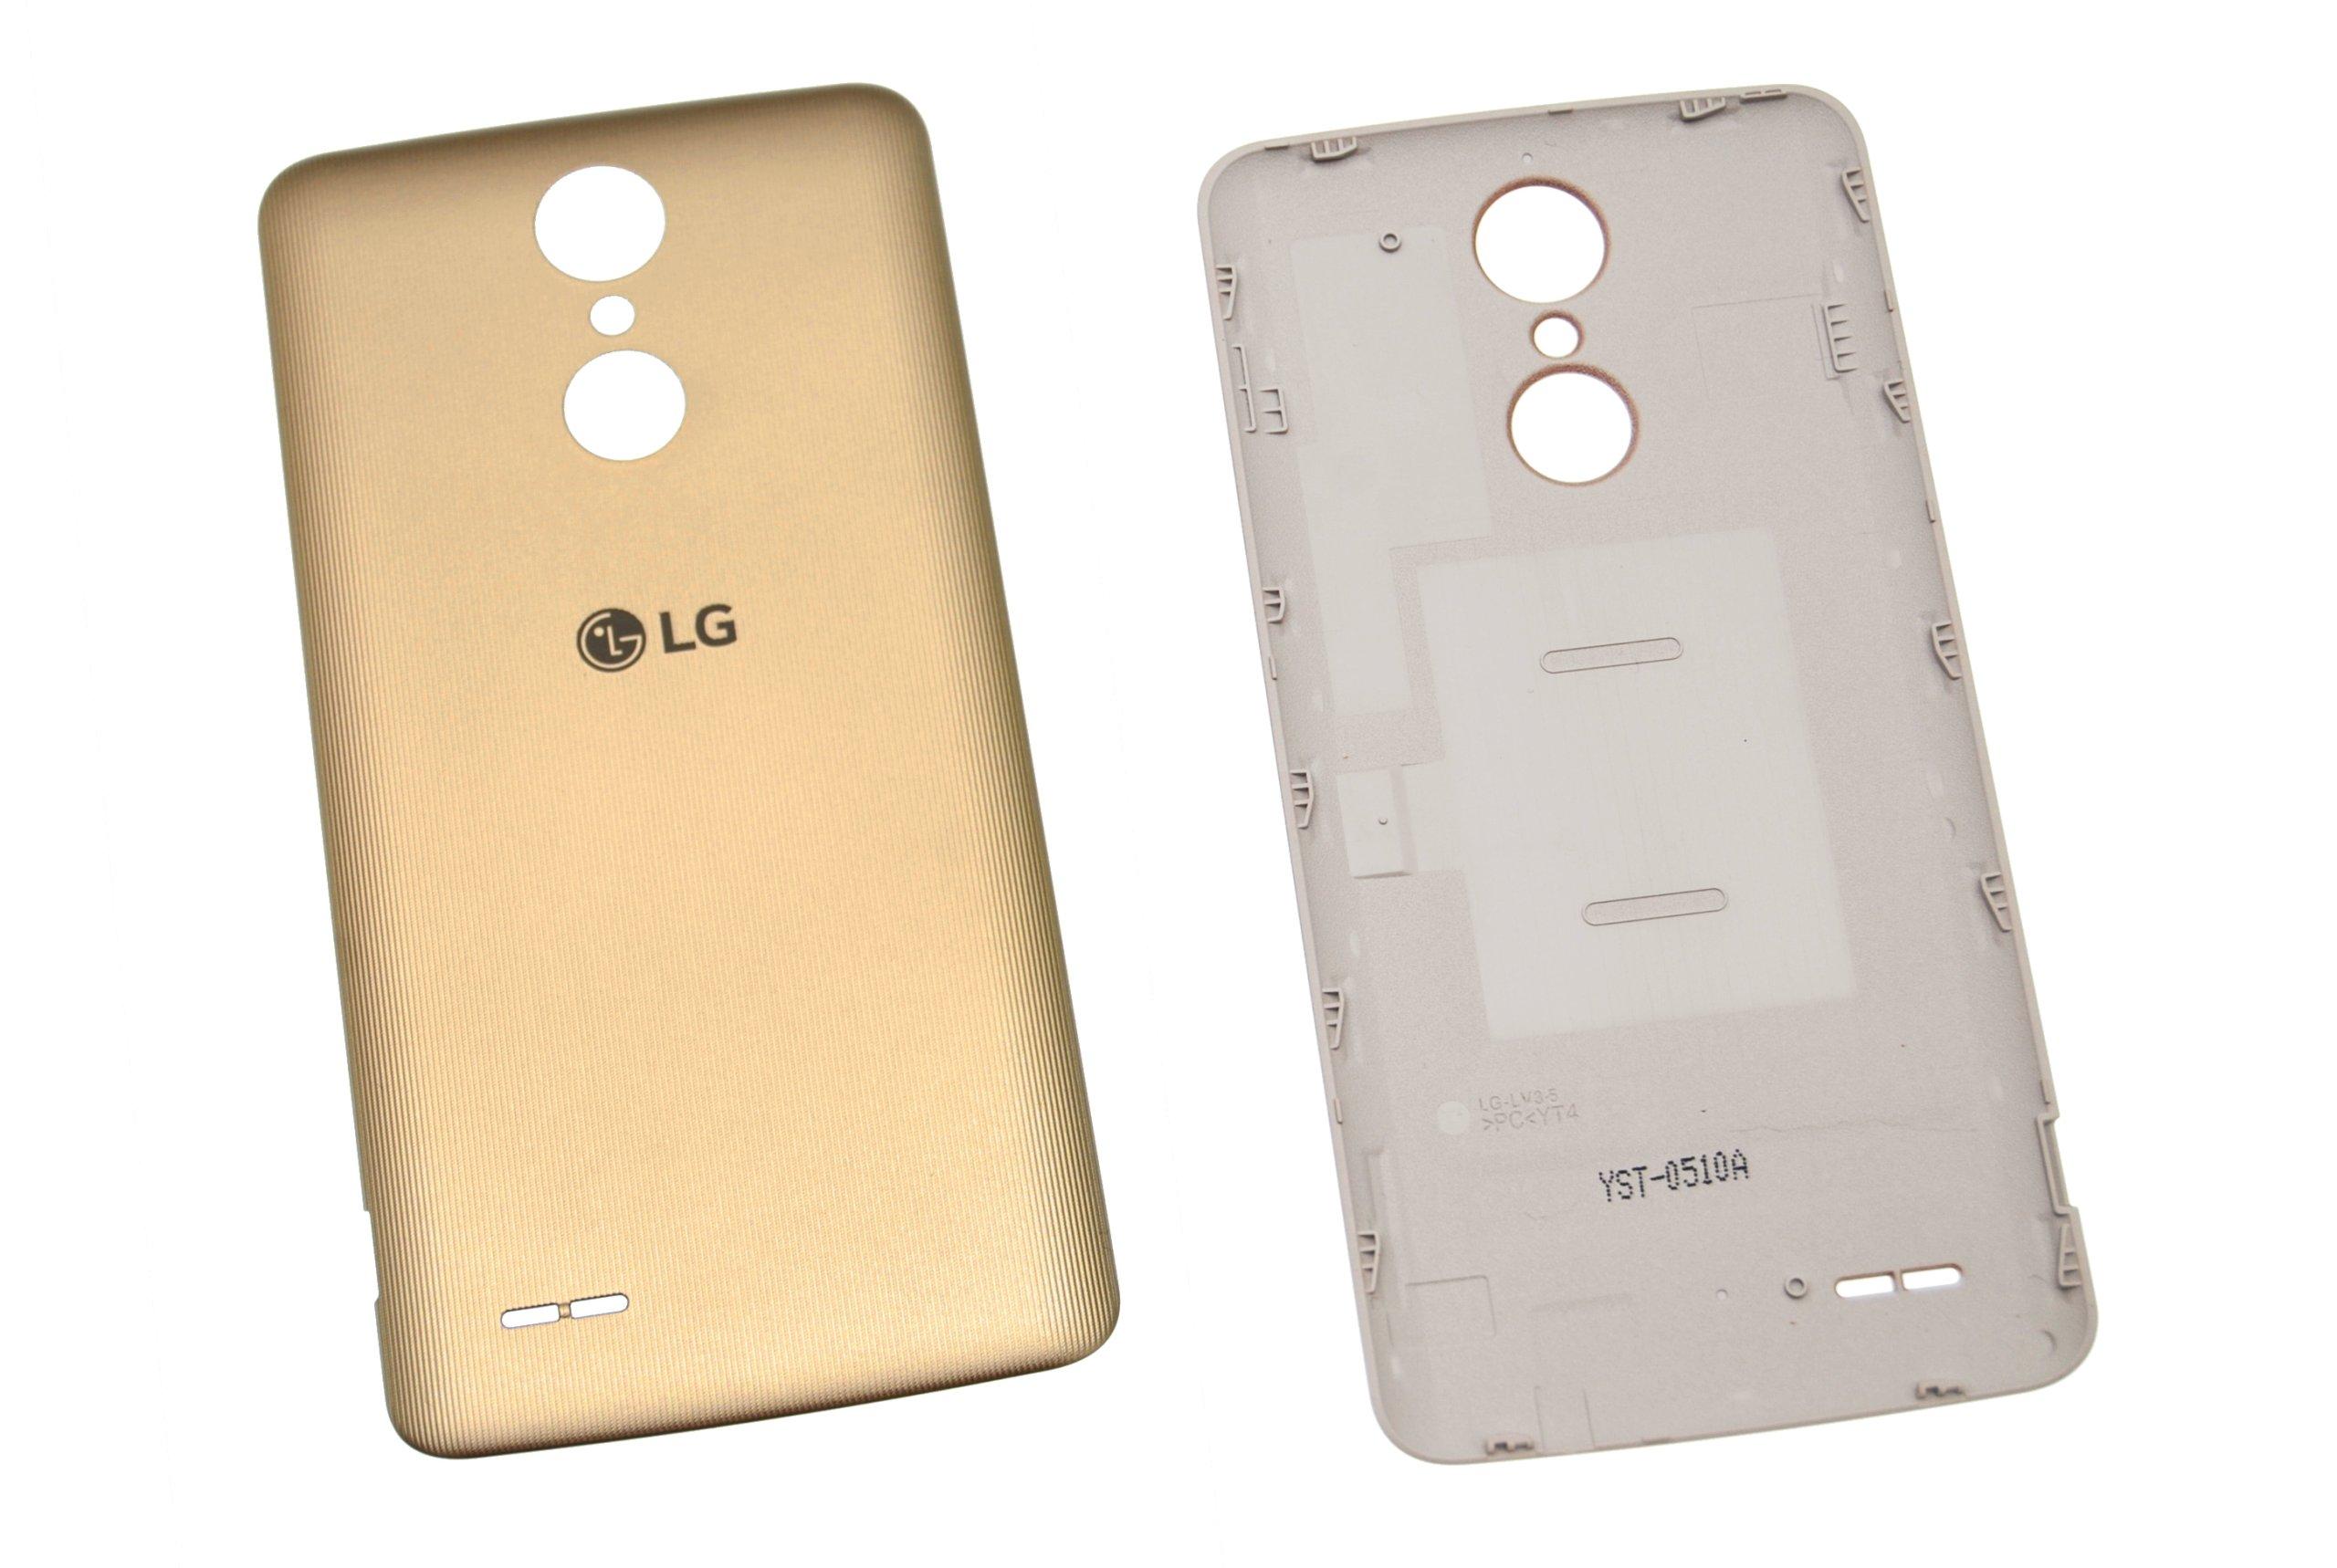 Klapka pokrywa baterii: LG K8 2017 M200 M200N X240